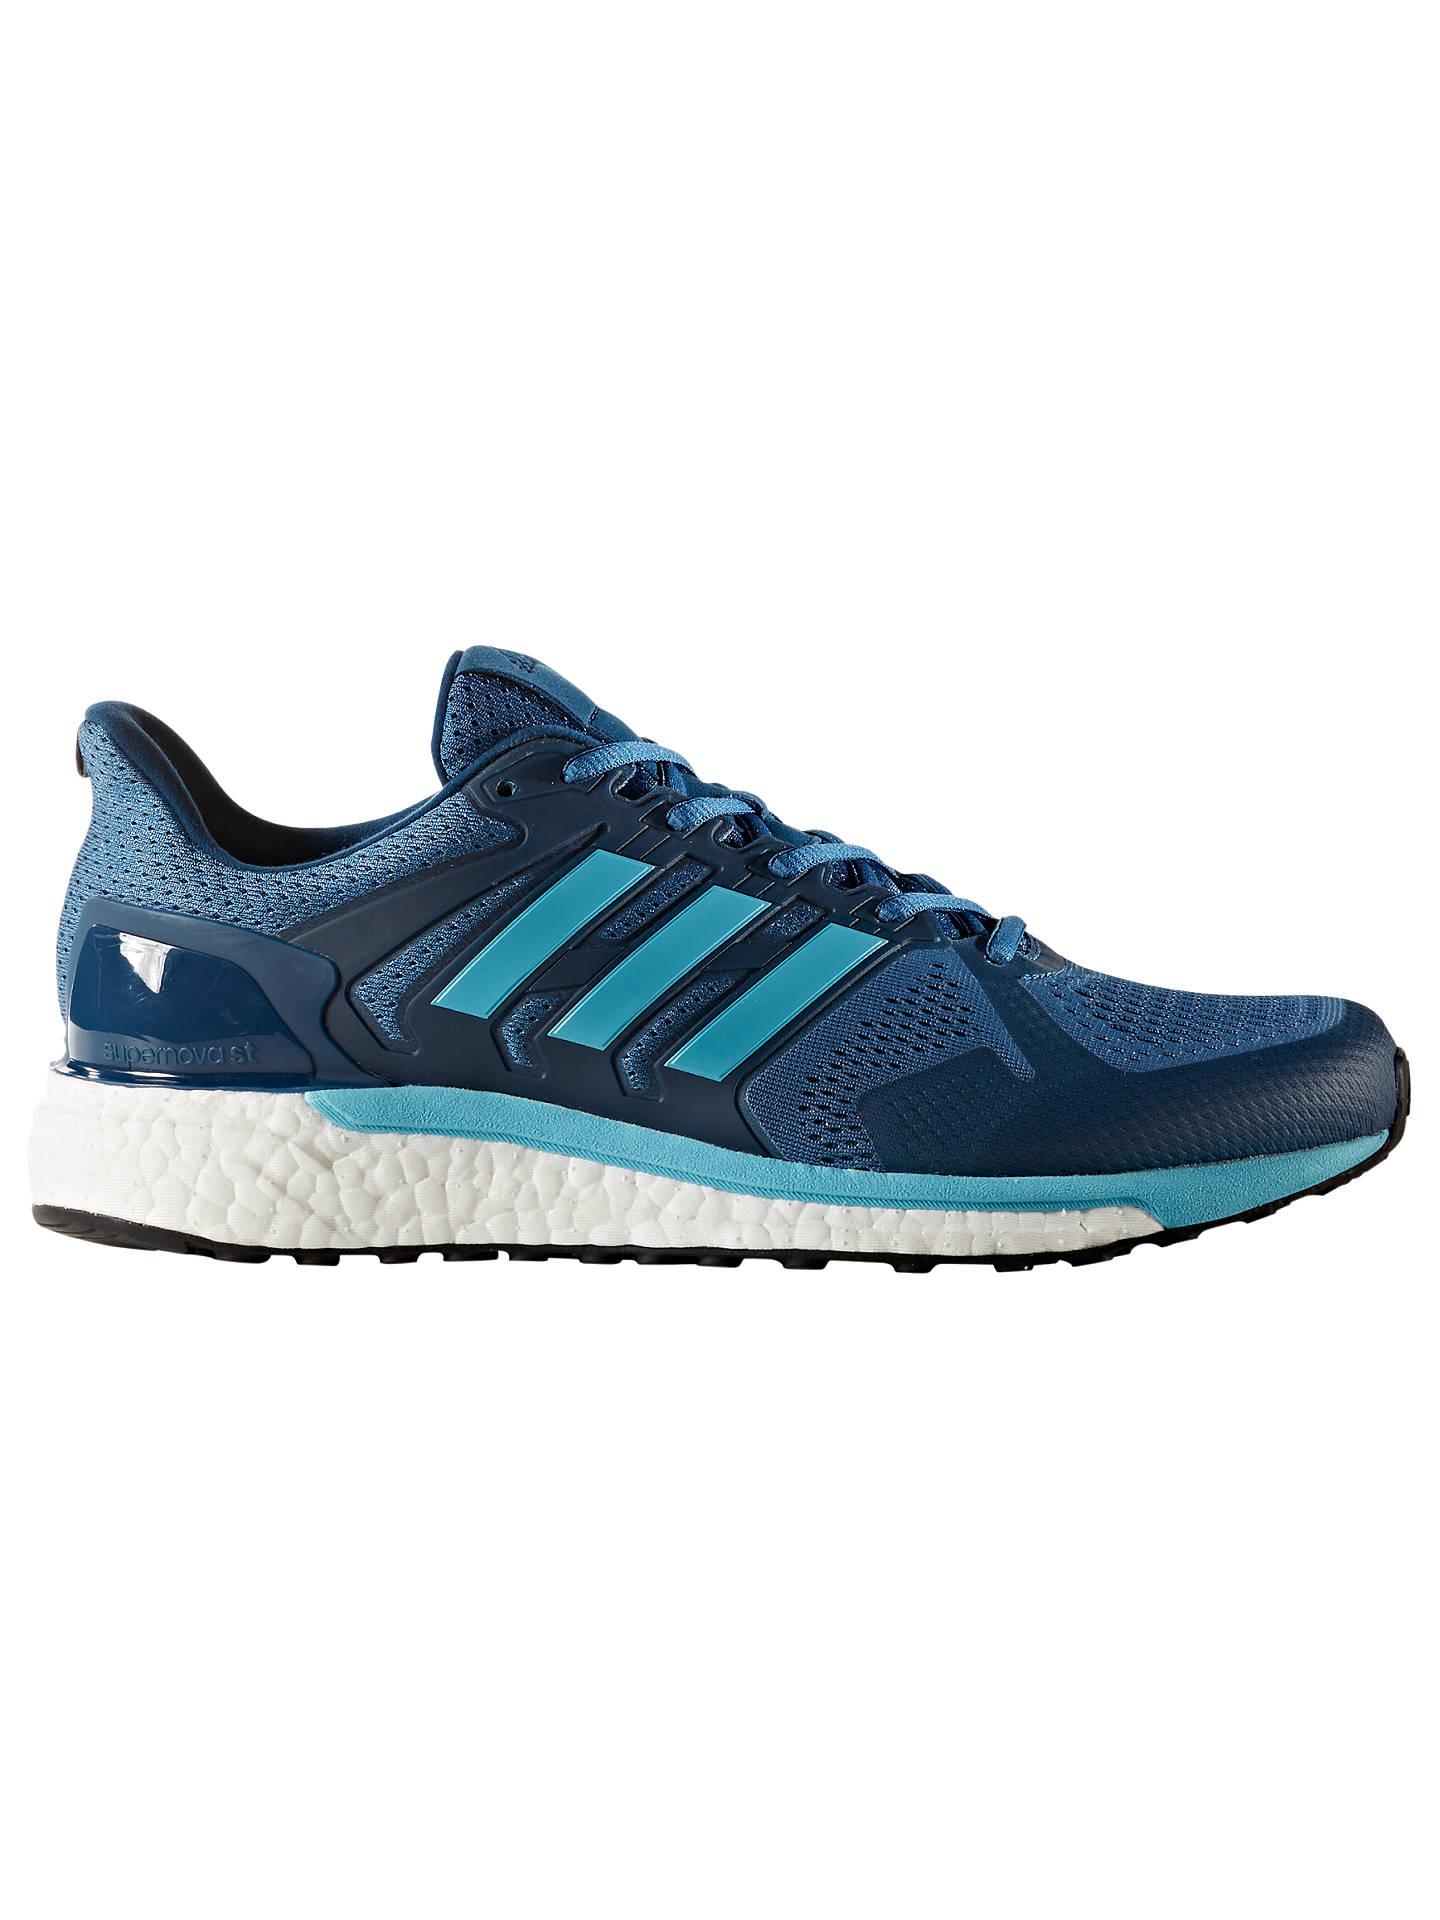 860a311f2 Buy adidas Supernova ST Men s Running Shoes